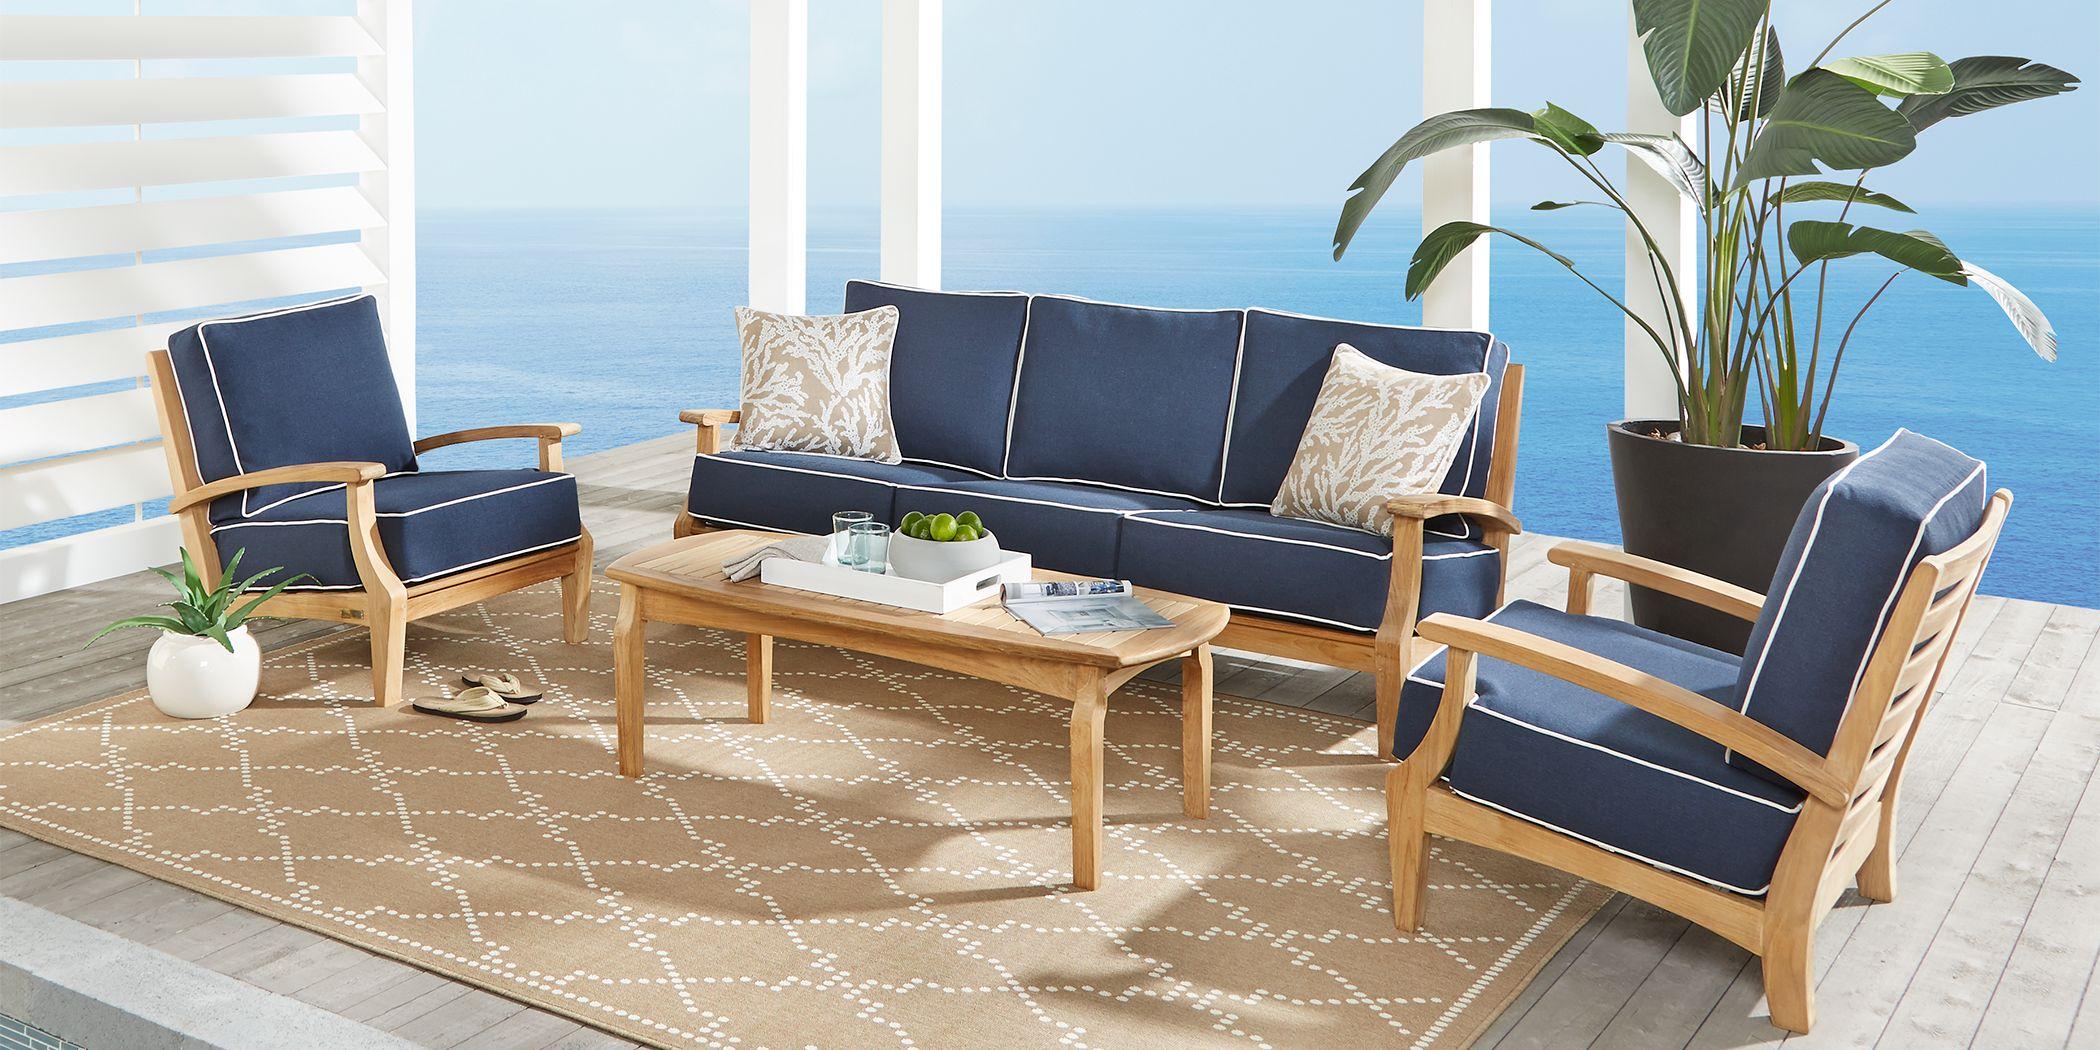 Pleasant Bay Teak Tan 6 Pc Outdoor Seating Set with Denim Cushions